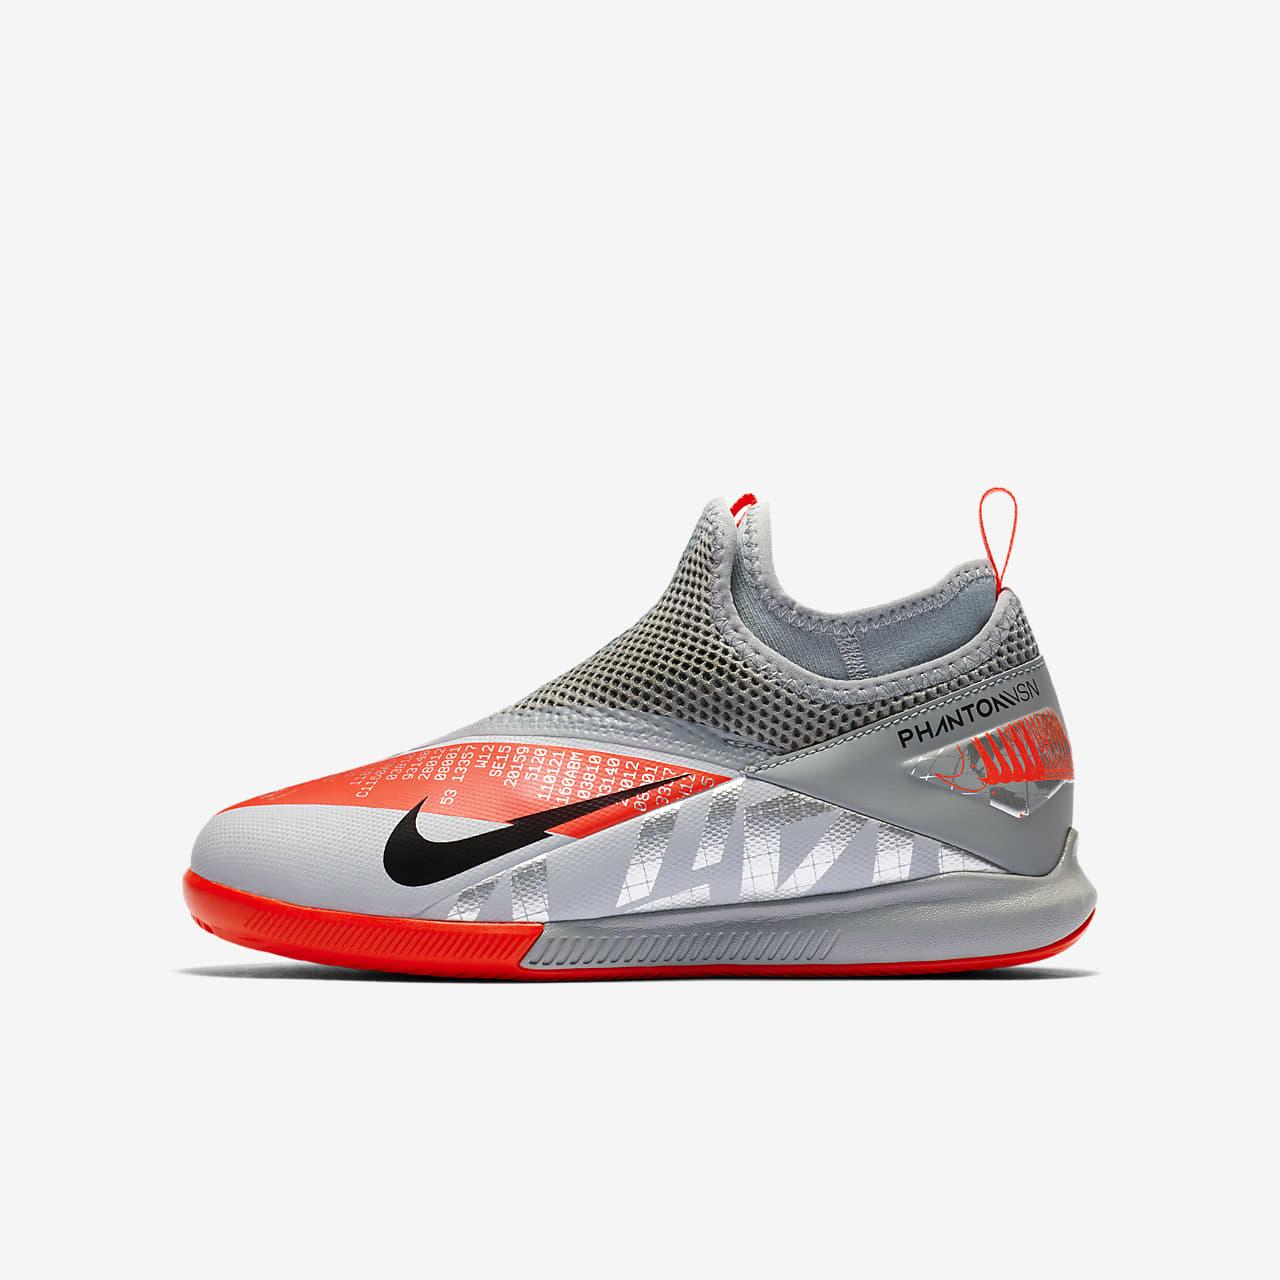 Nike Jr. Phantom Vision 2 Academy Dynamic Fit IC Botas de fútbol sala - Niño/a y niño/a pequeño/a